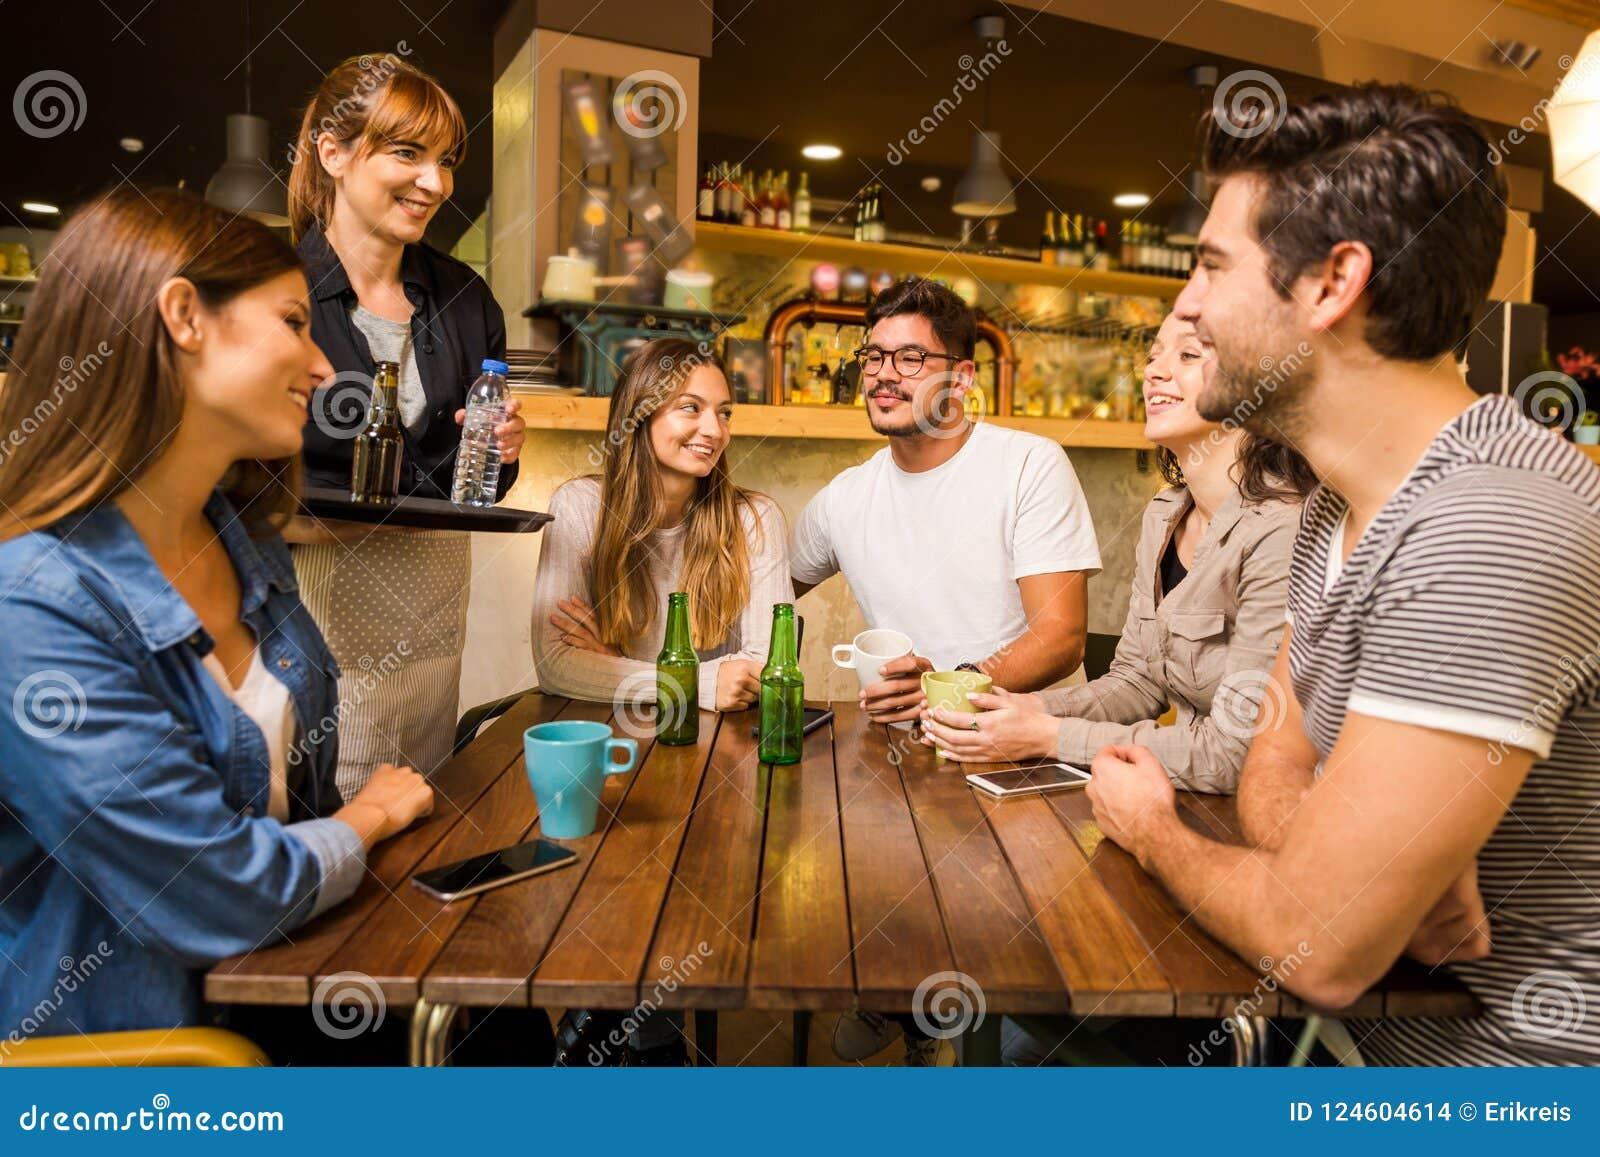 Talking to the waitress